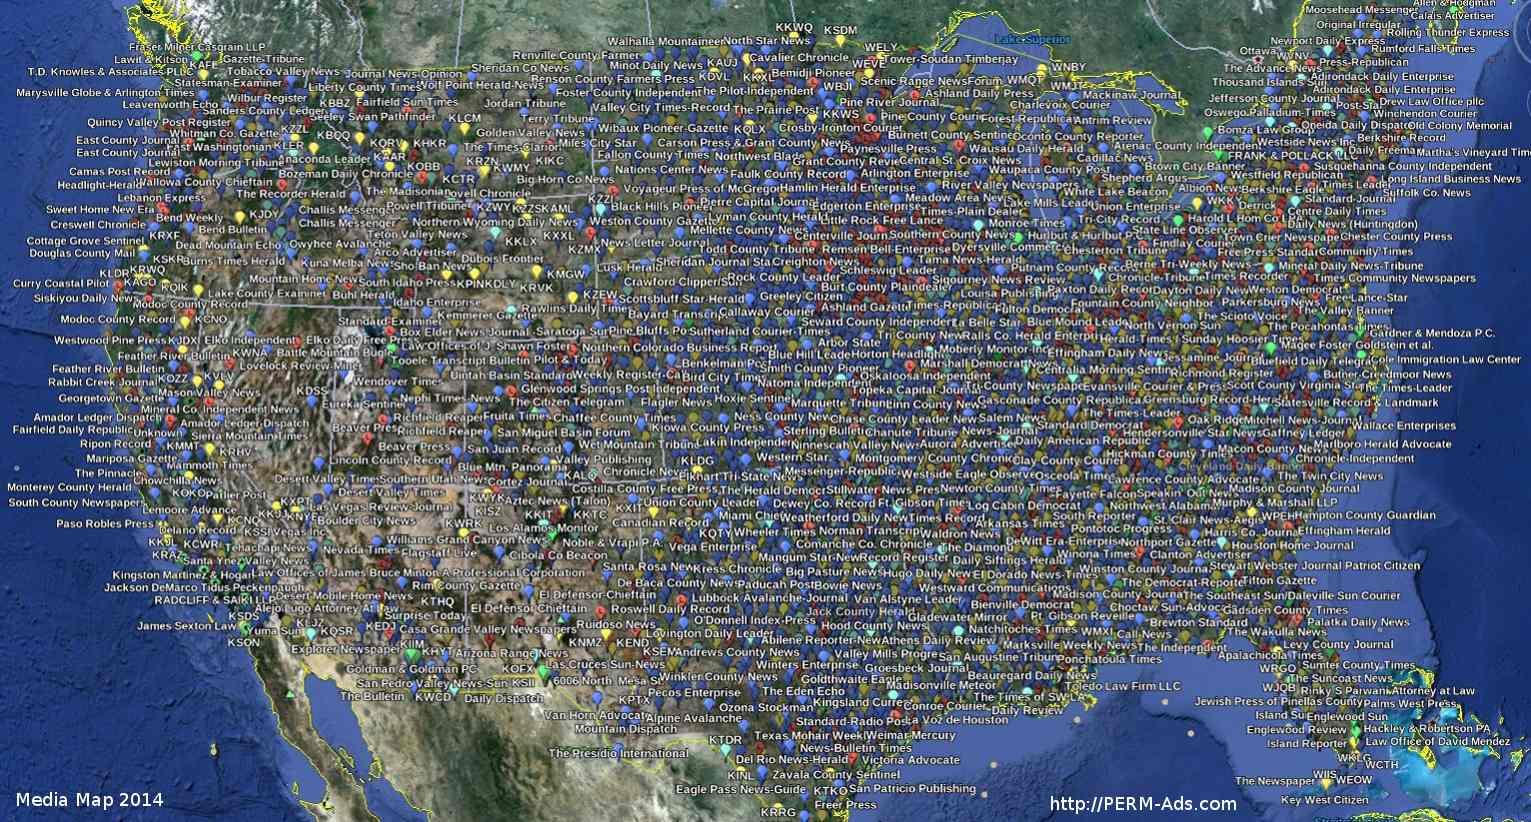 PERM ADS NATIONWIDE MEDIA MAP